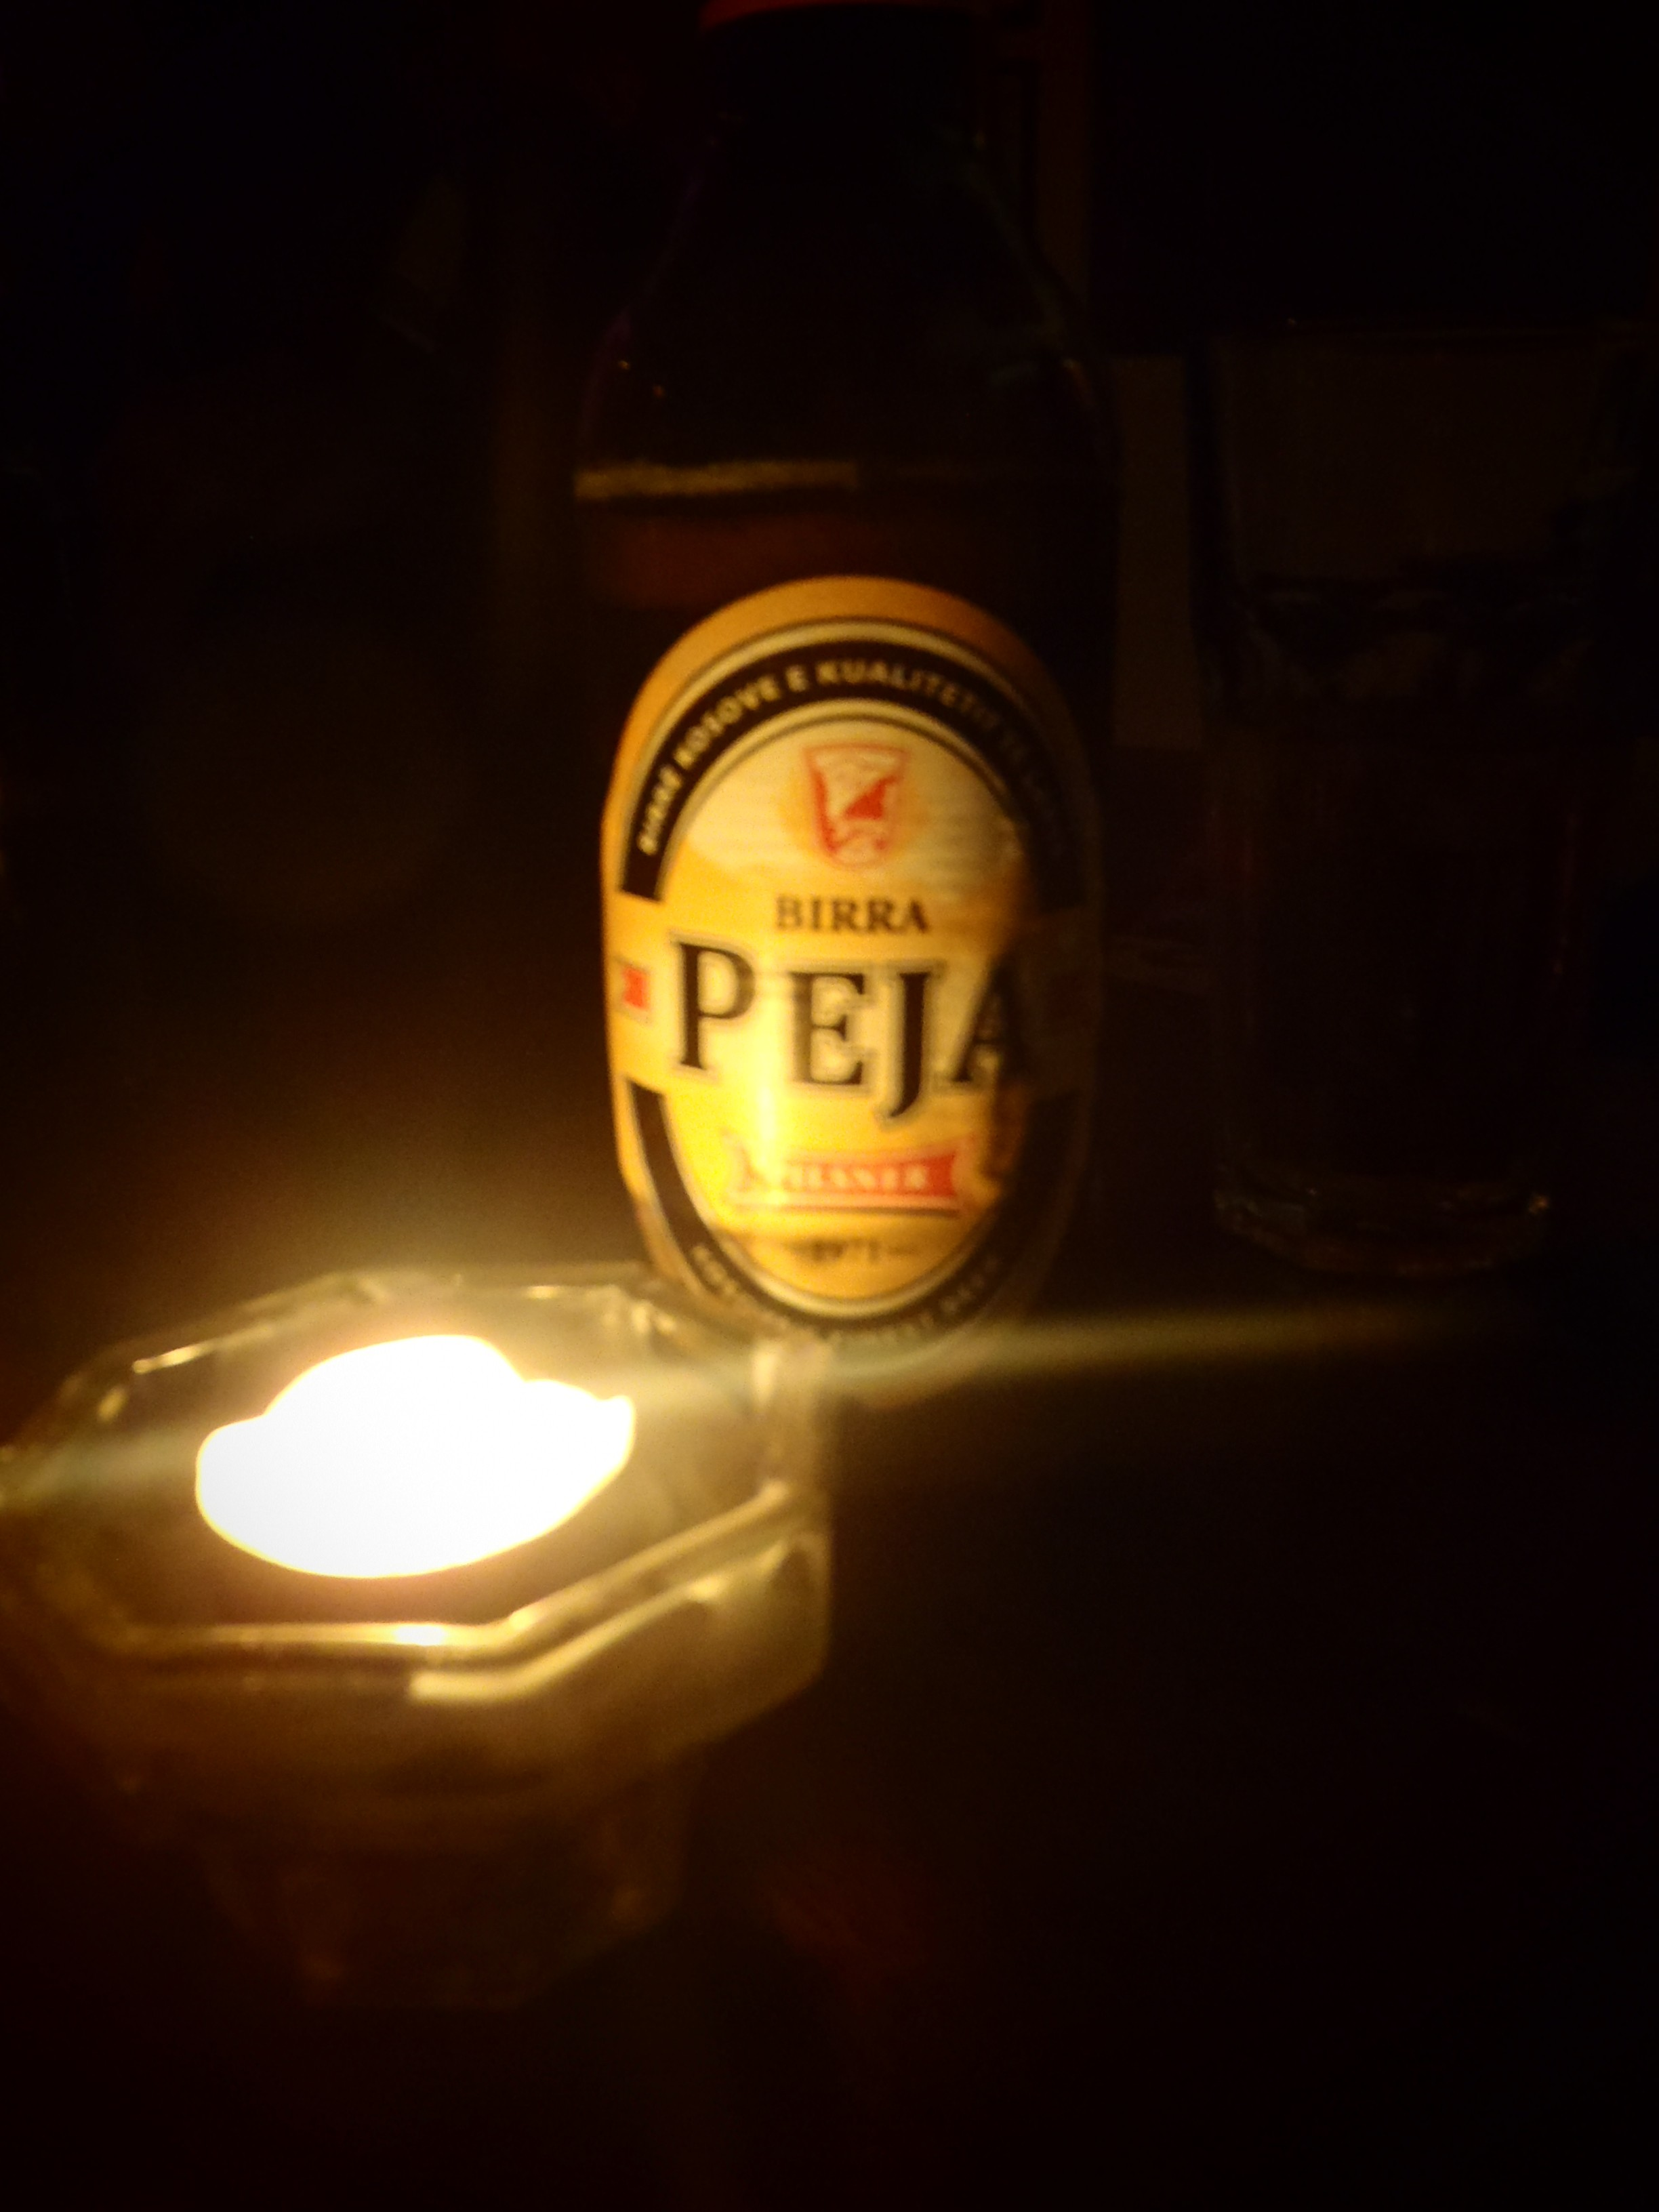 Creative Peja Beer Shot; Pristina, Kosovo; 2013